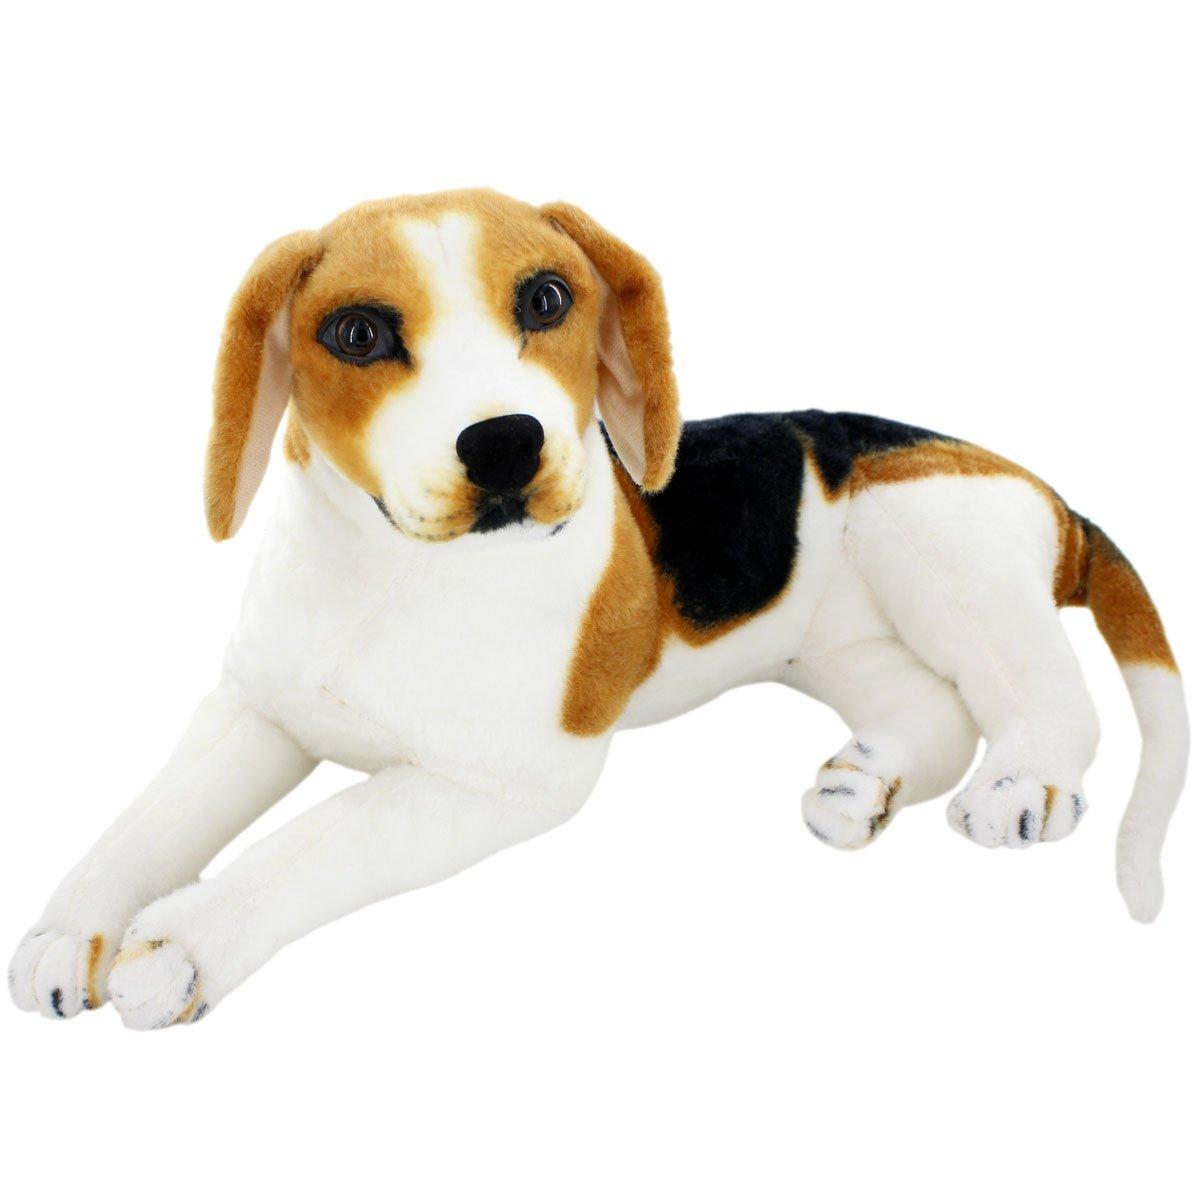 jesonn giant realistic stuffed animals beagle dog plush toys 17 7 or 45cm 1pc. Black Bedroom Furniture Sets. Home Design Ideas